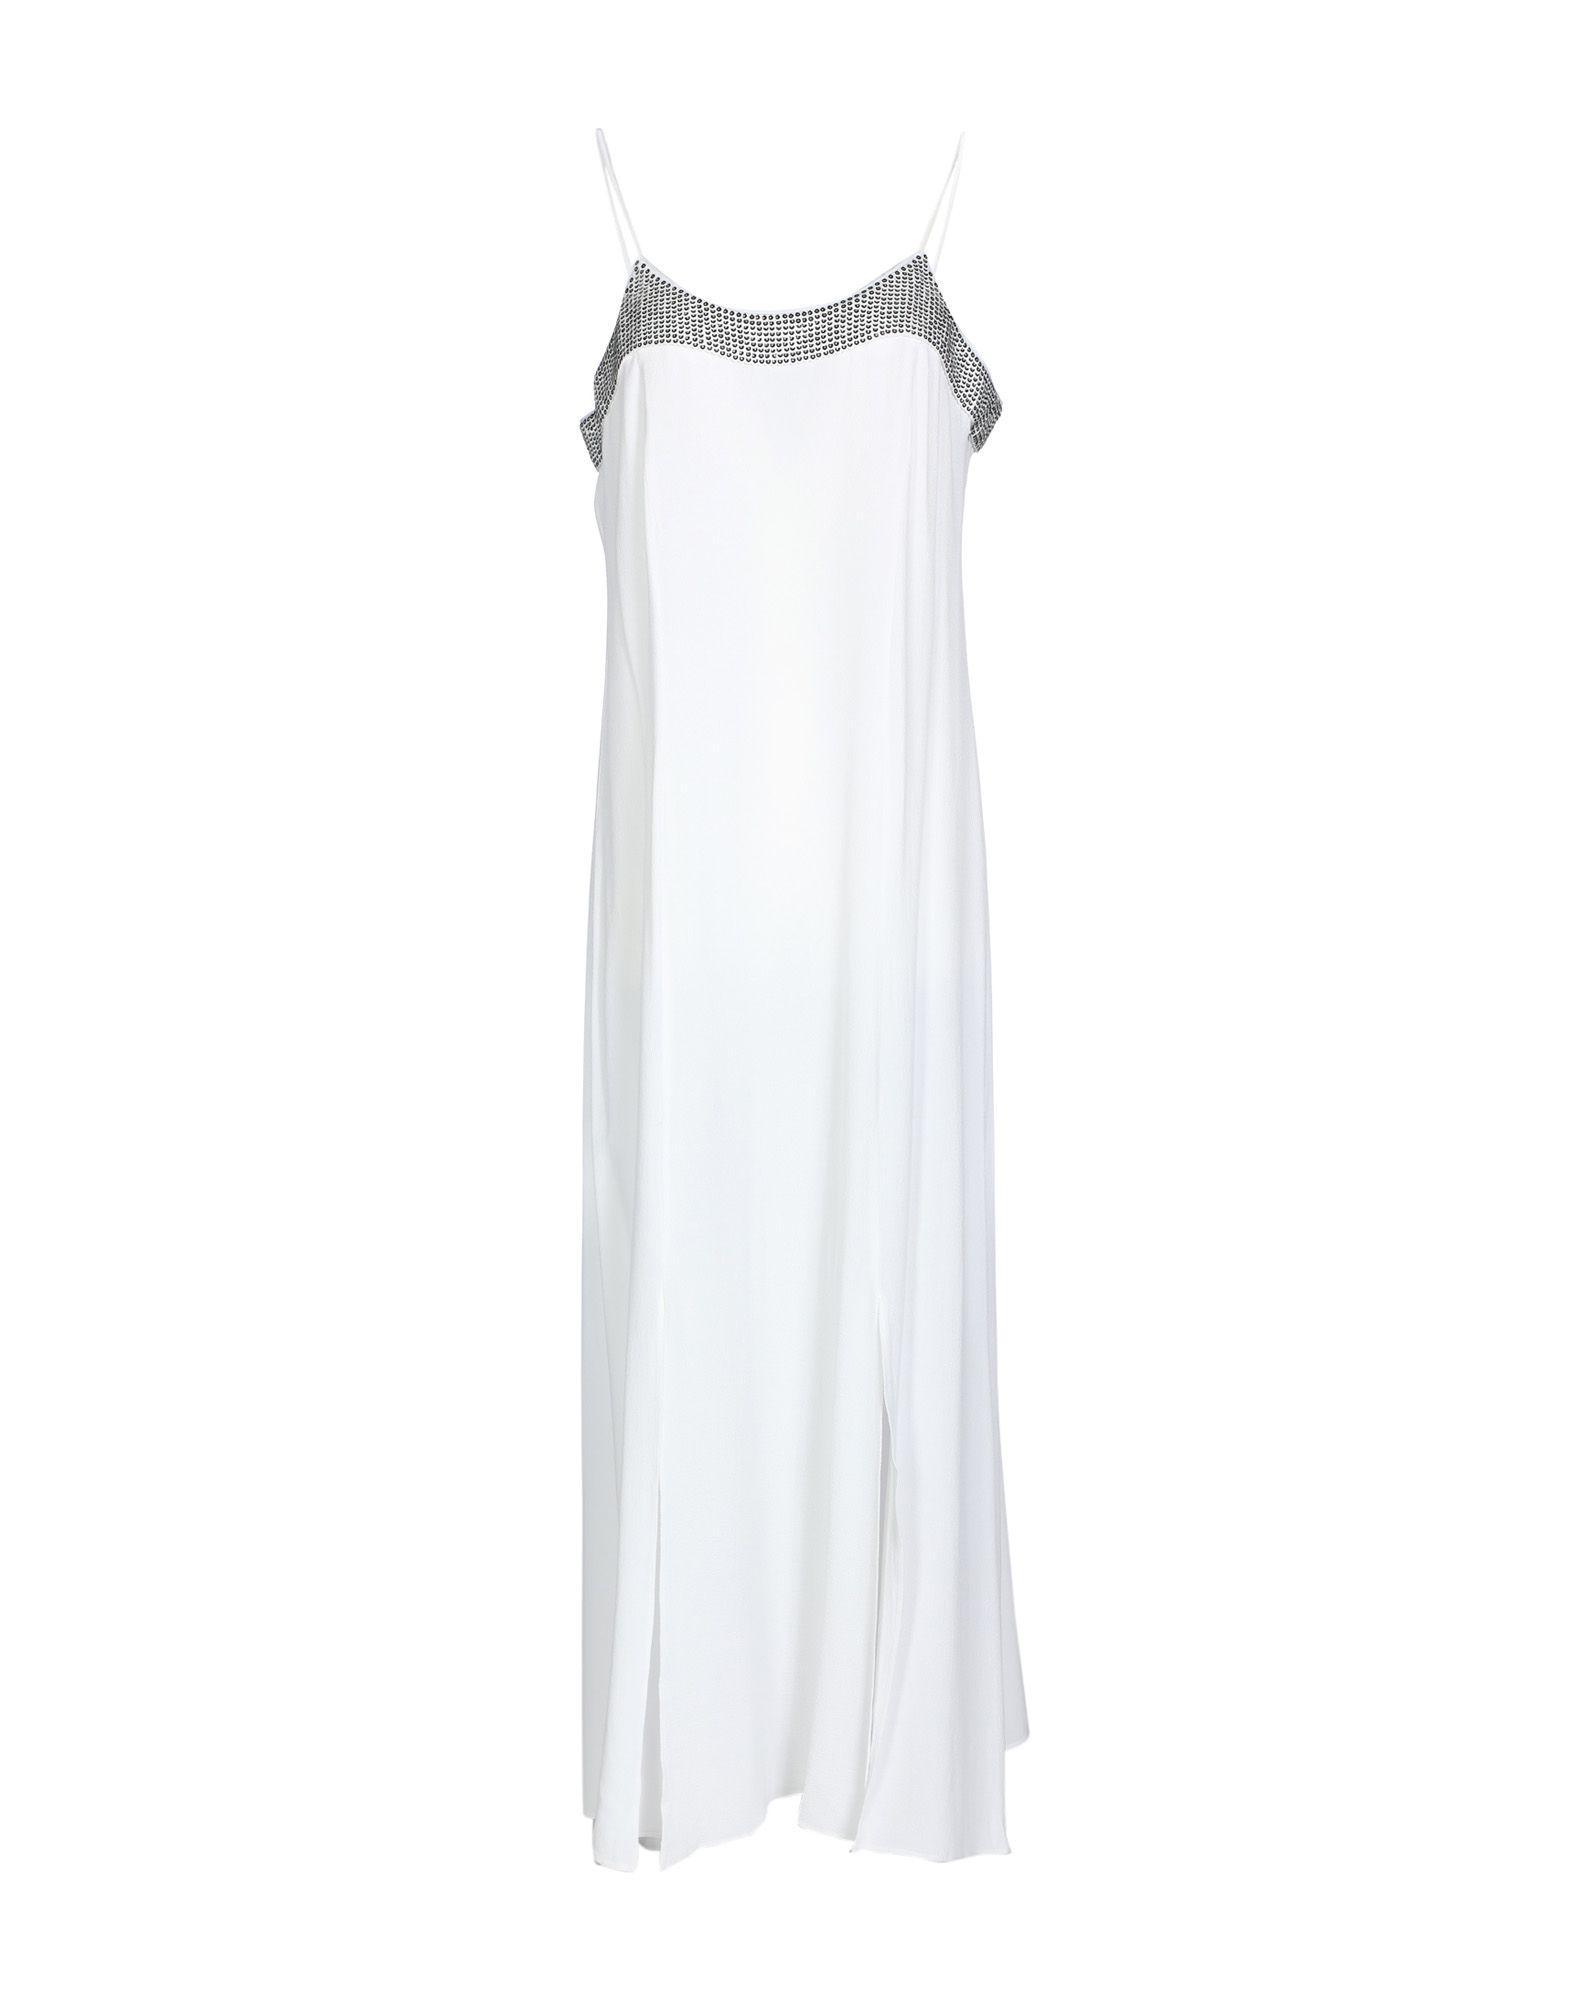 Armani Exchange Midi Dress In White